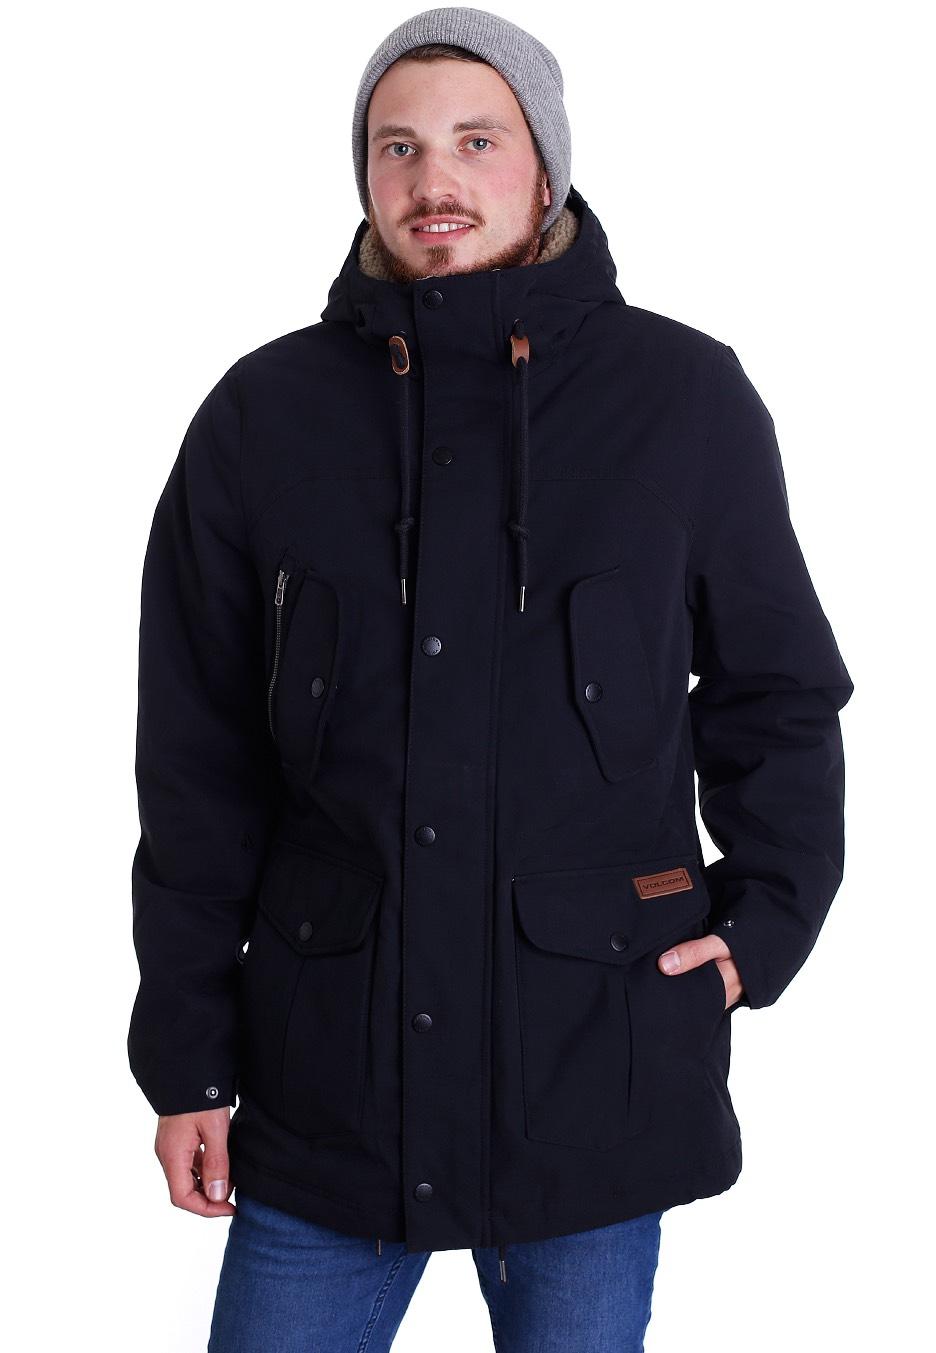 exklusives Sortiment Mode-Design Genieße den niedrigsten Preis Volcom - Starget Parka Update - Jacket